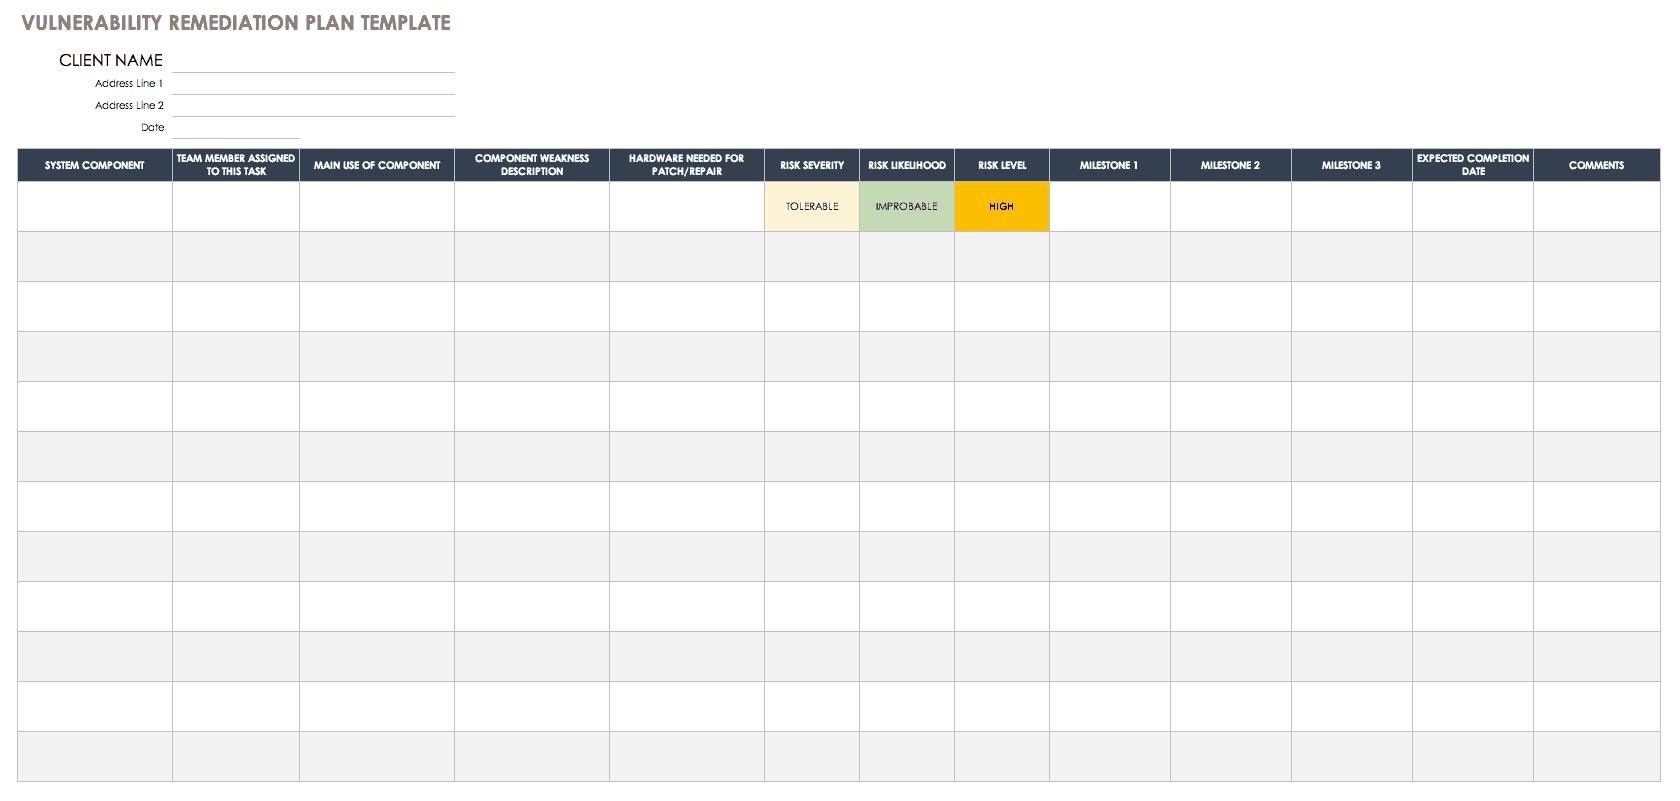 Security self assessment questionnaire template; Free Vulnerability Assessment Templates Smartsheet